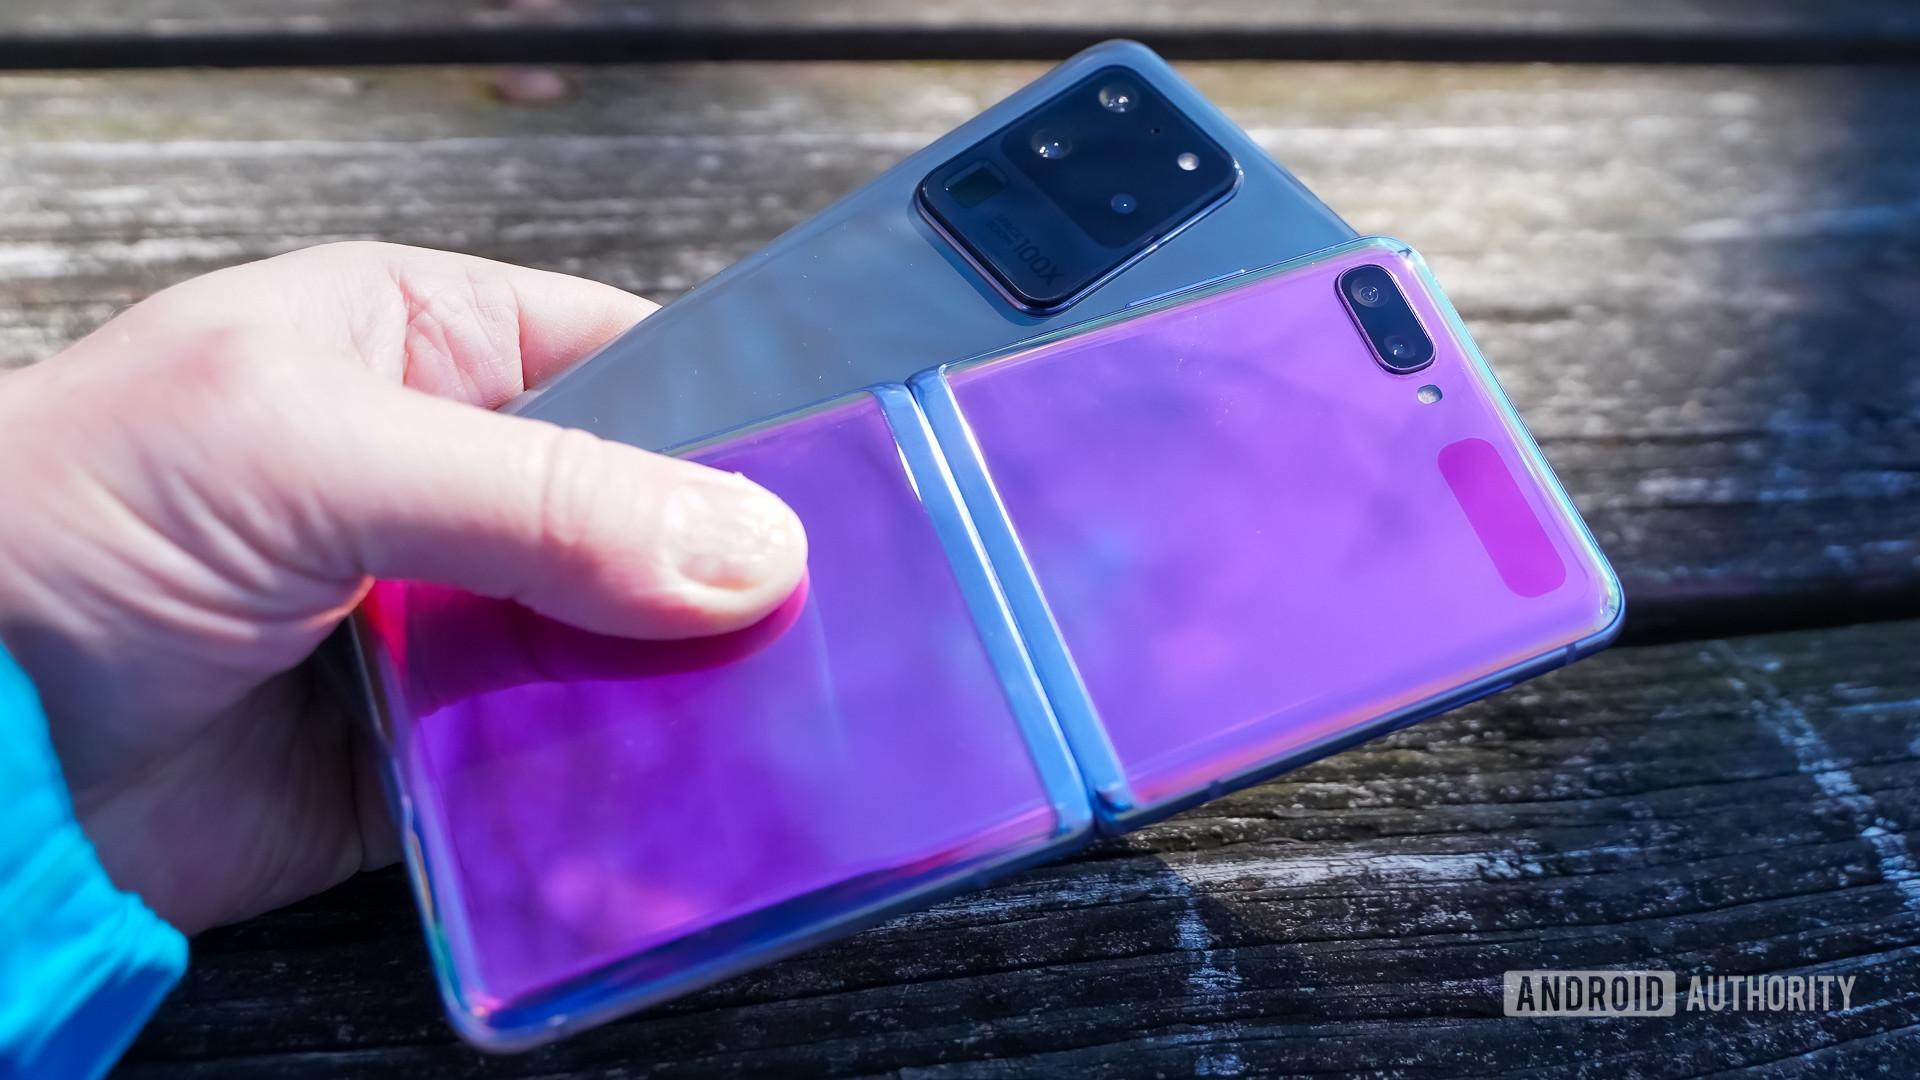 Samsung Galaxy S20 Ultra or Z Flip rear panels